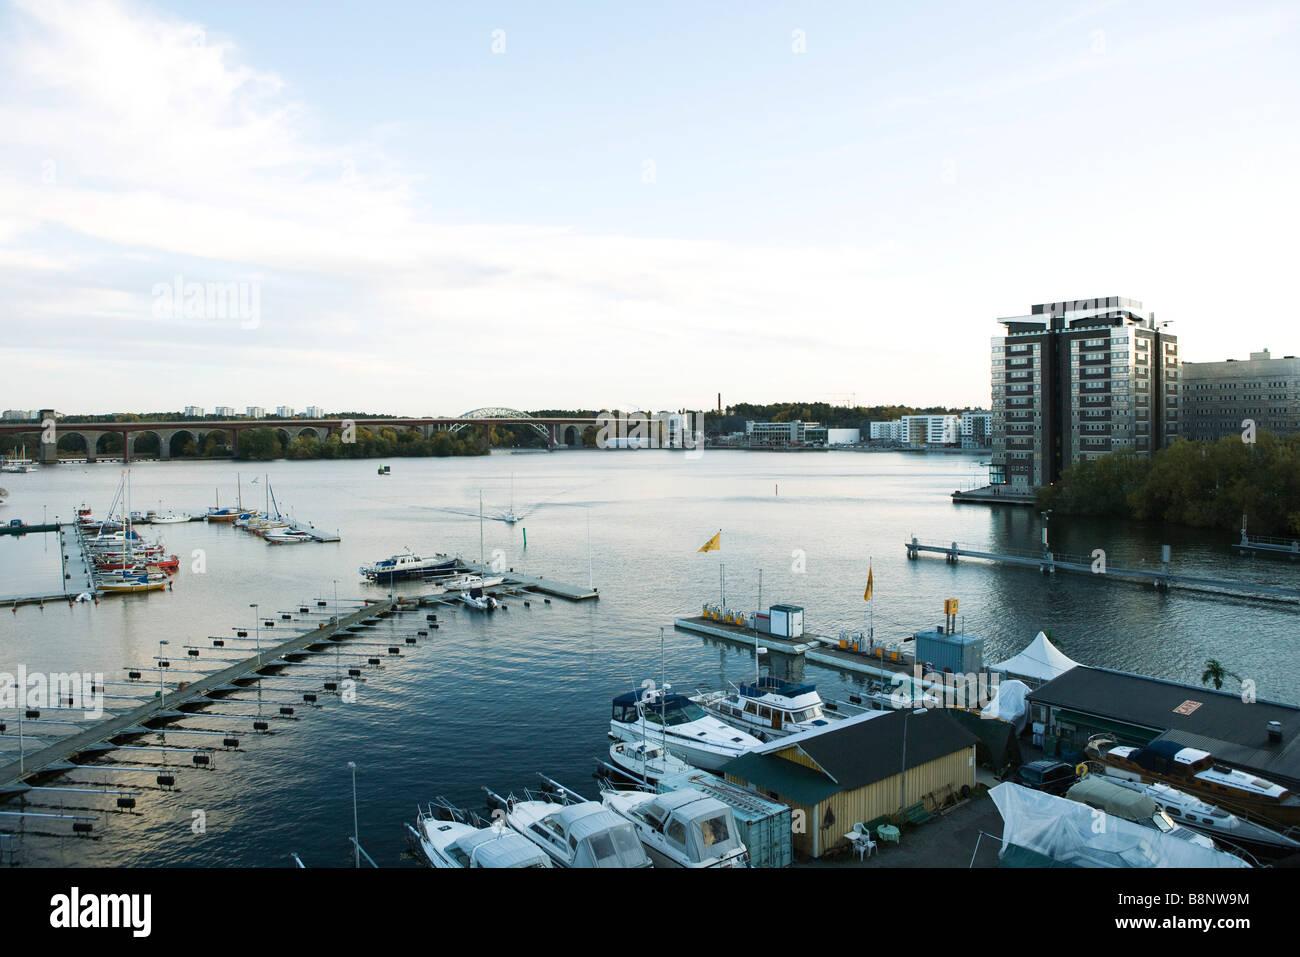 Sweden, Stockholm, Lake Malaren, marina - Stock Image